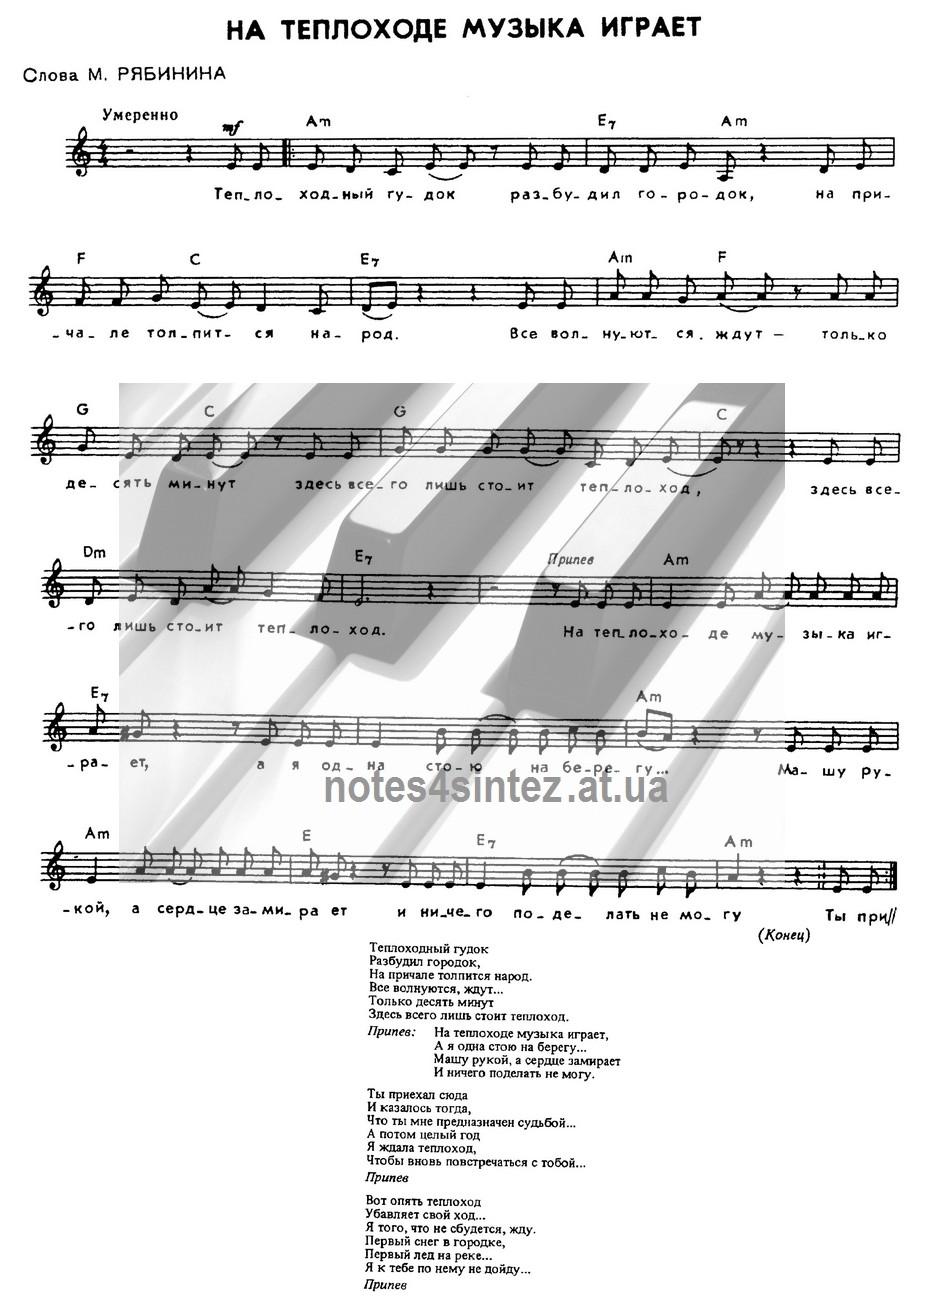 Текст песни на теплоходе музыка играет